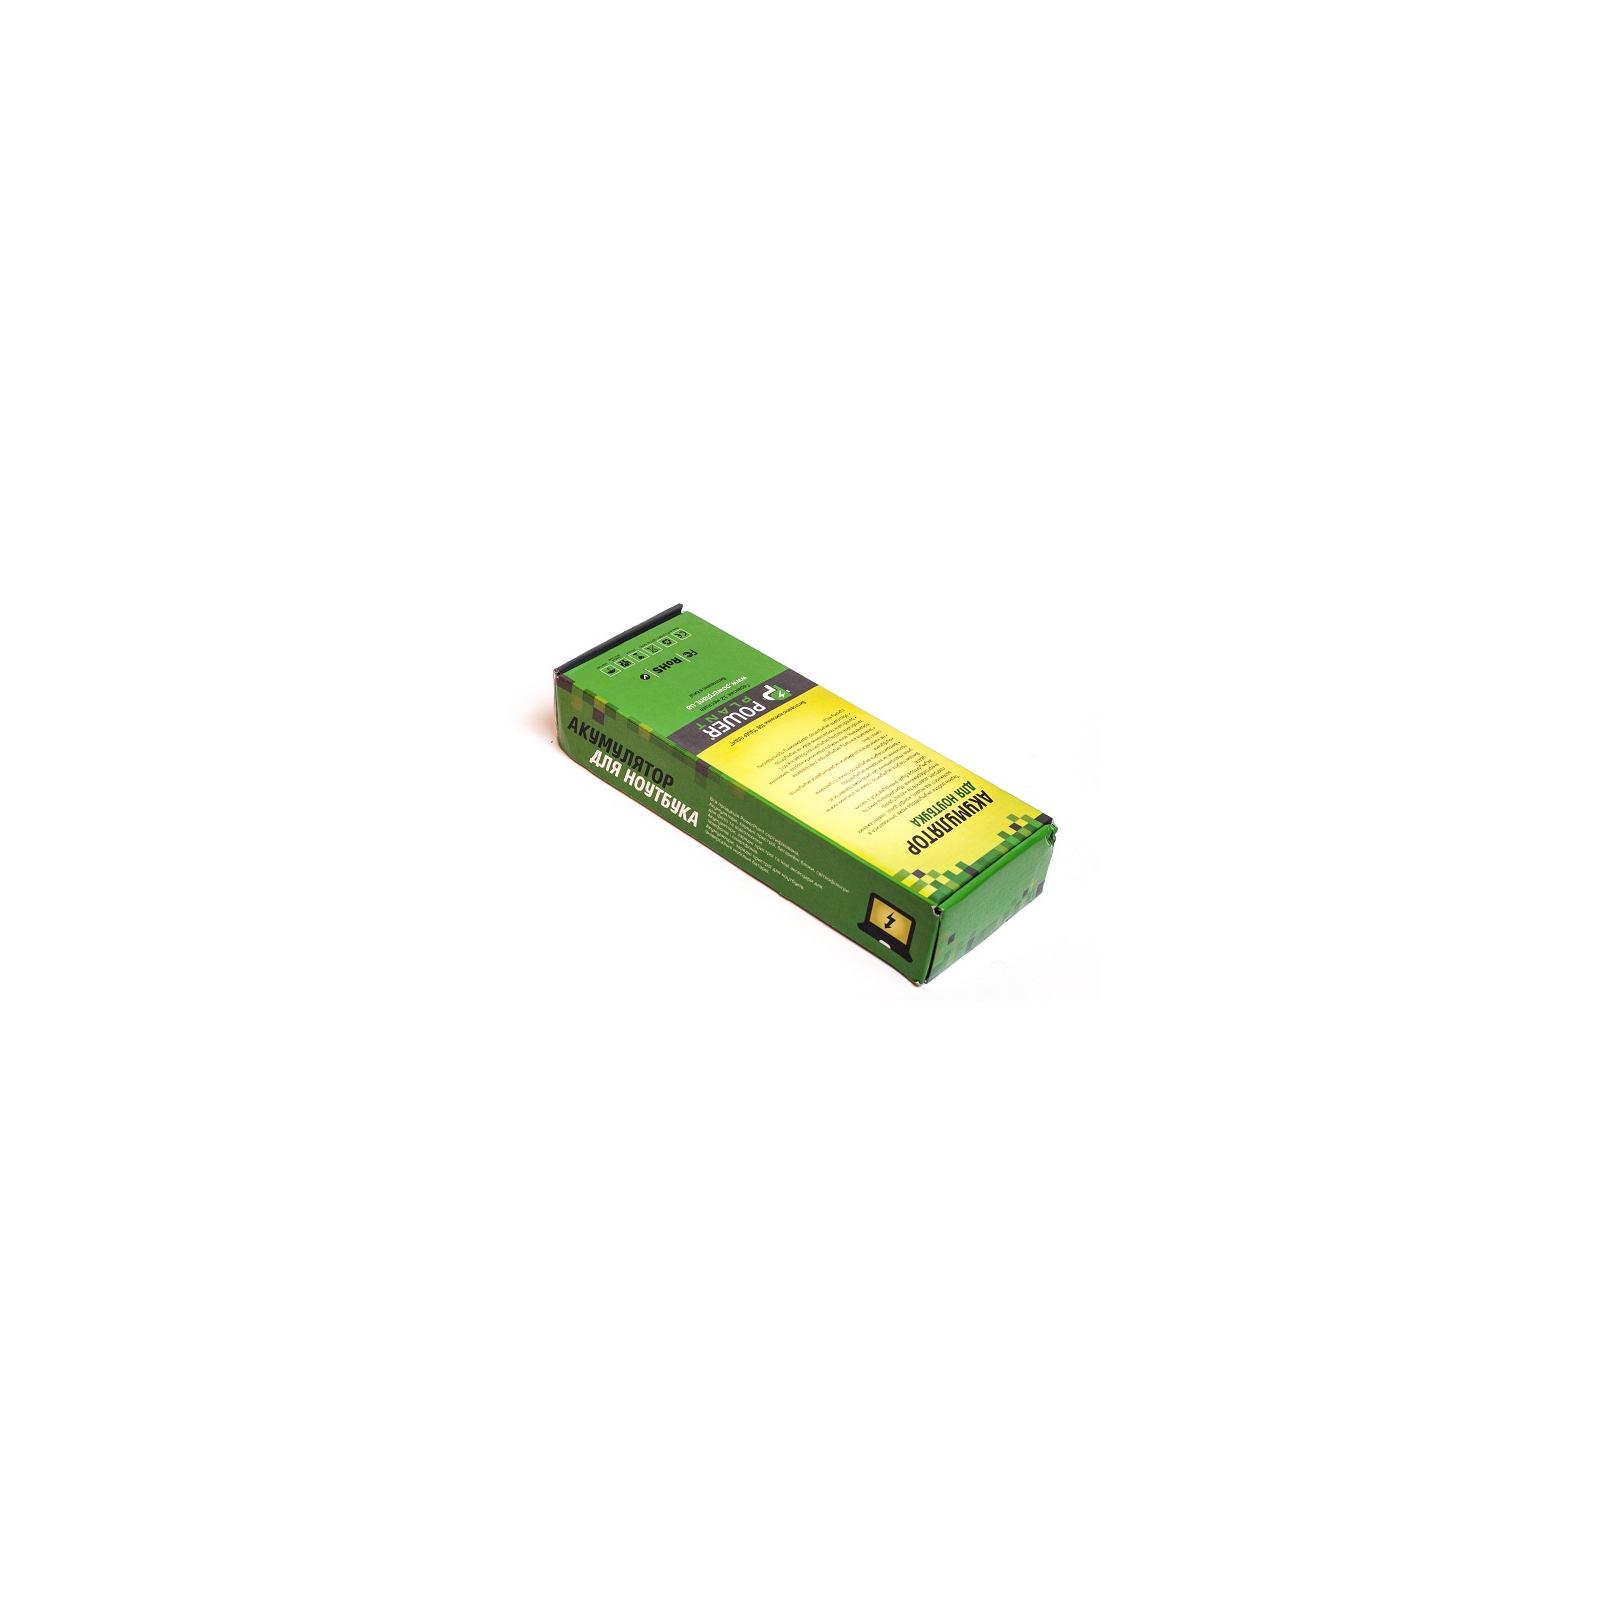 Аккумулятор для ноутбука DELL XPS 15 (R795X DLL401LH) 11,1V 4400mAh PowerPlant (NB00000190) изображение 2